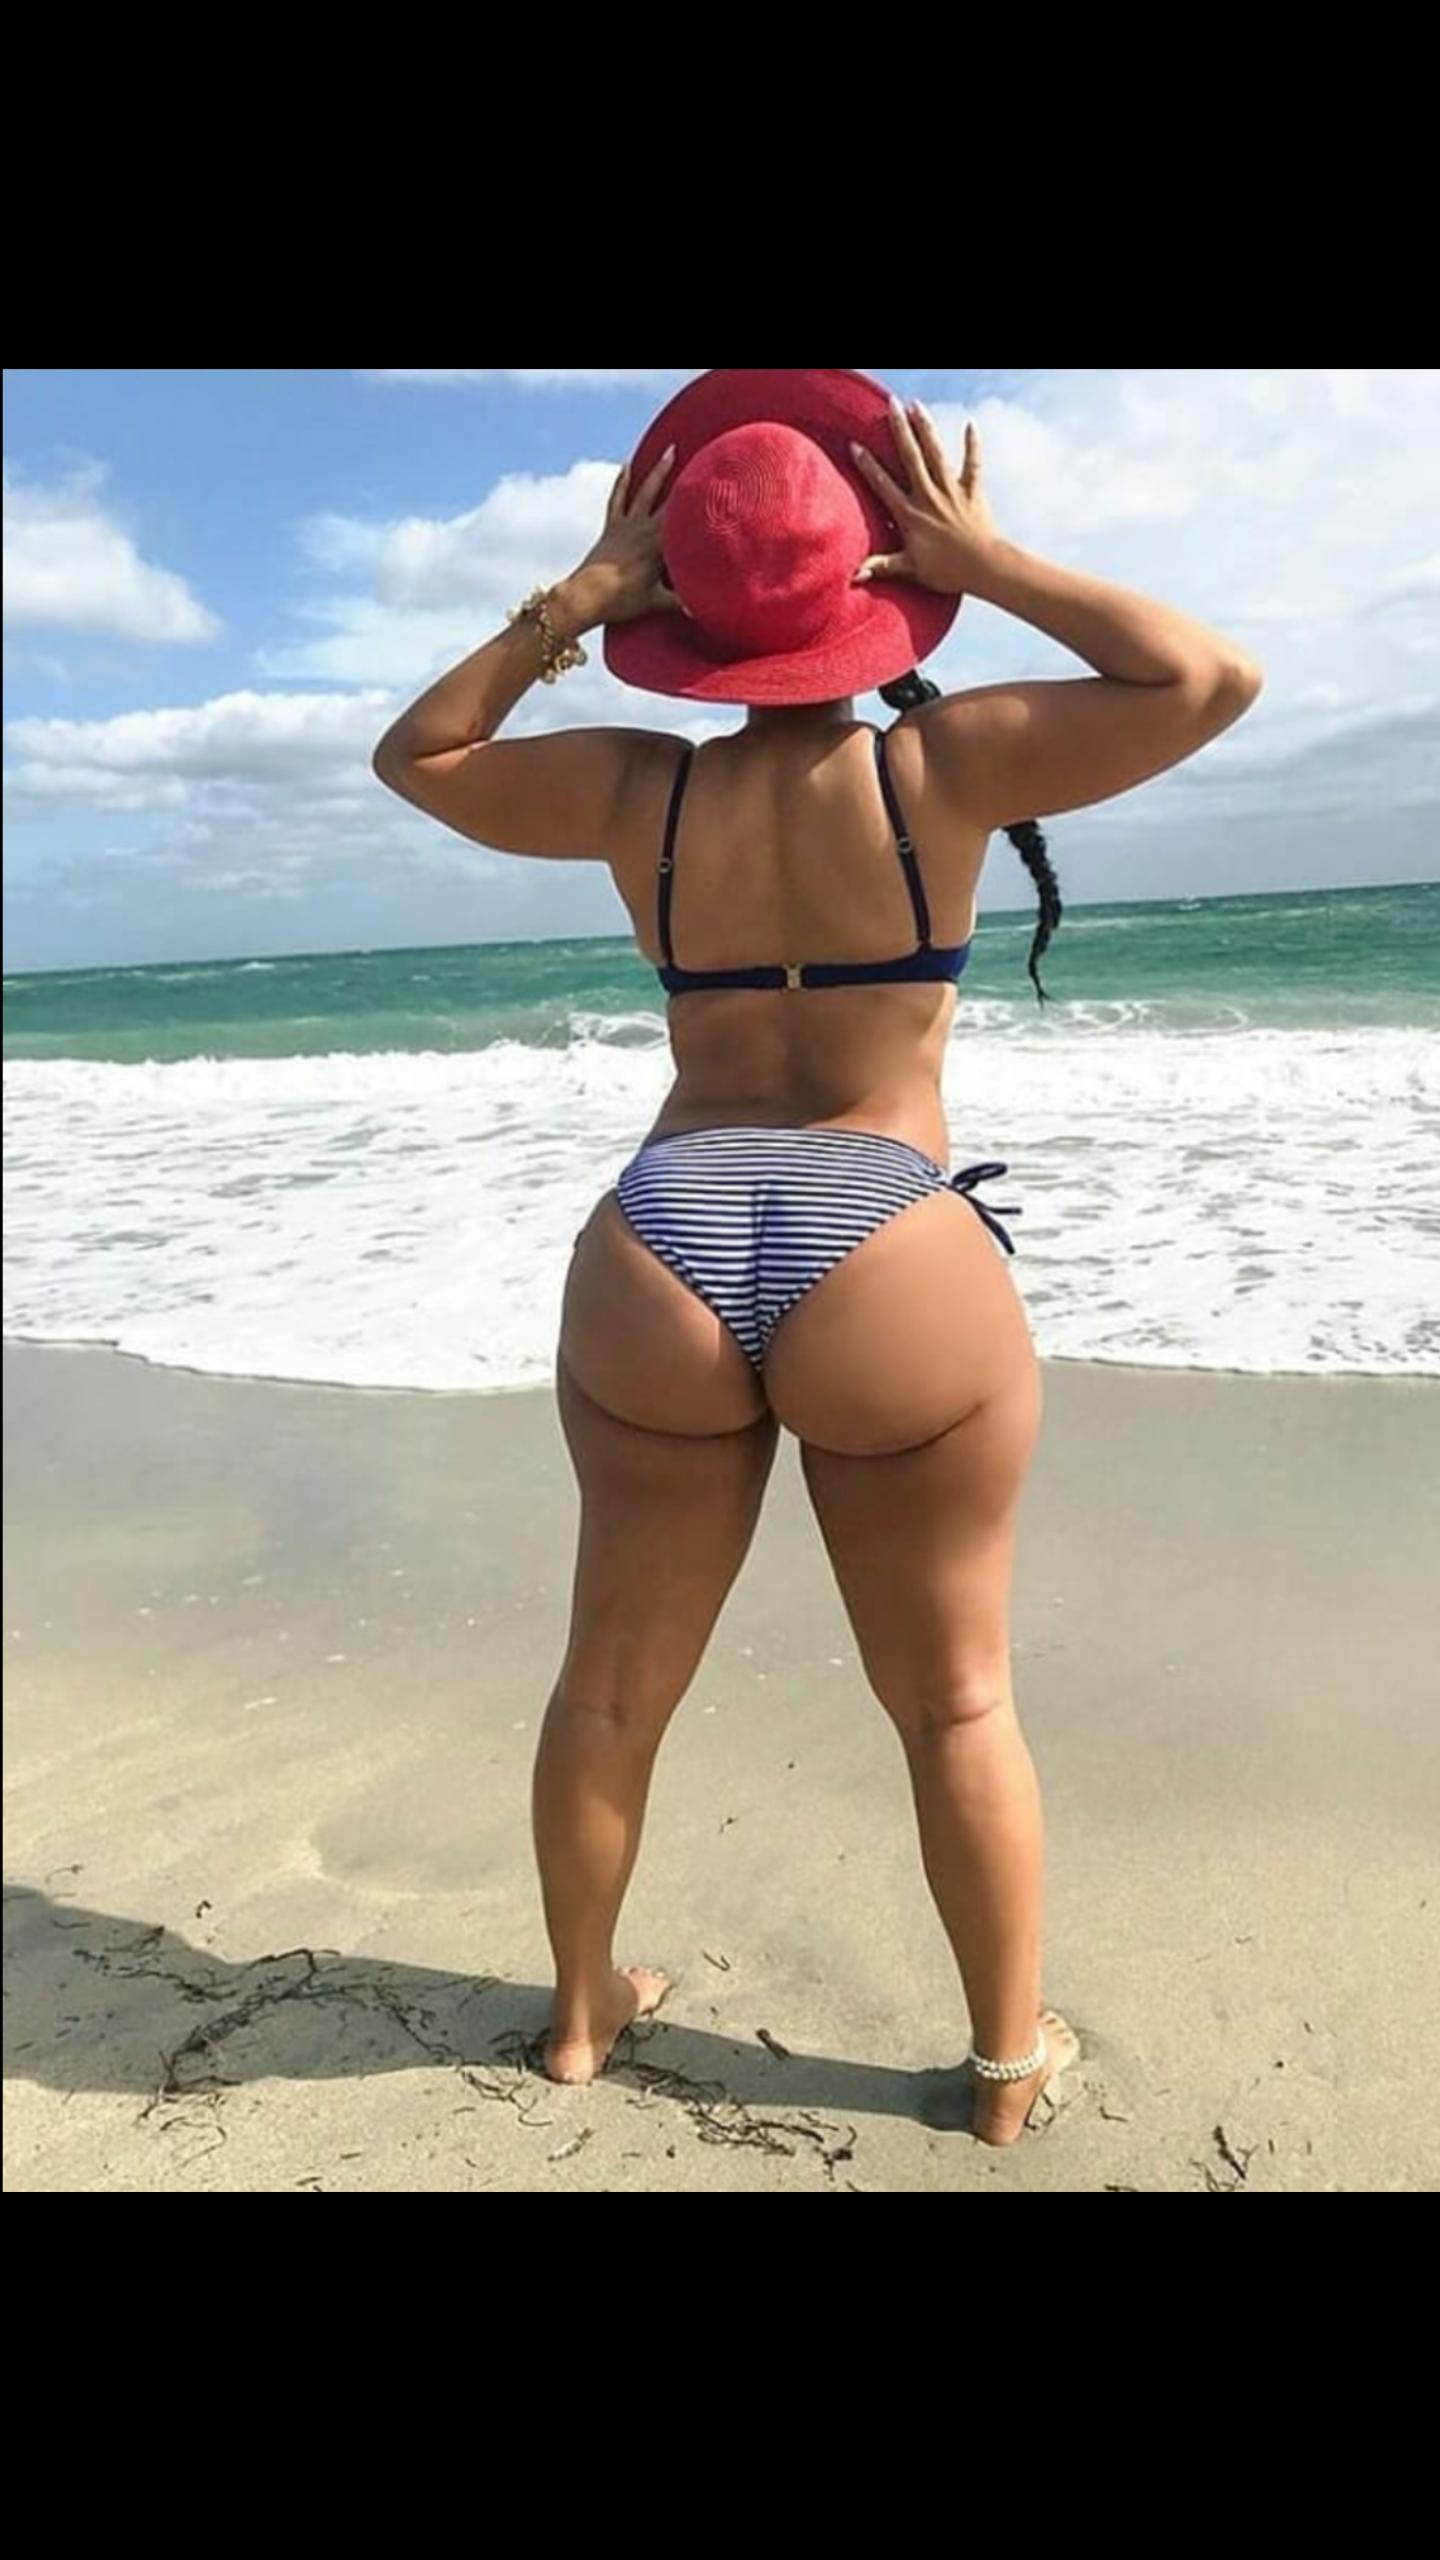 fette-bottom-girls-im-bikini